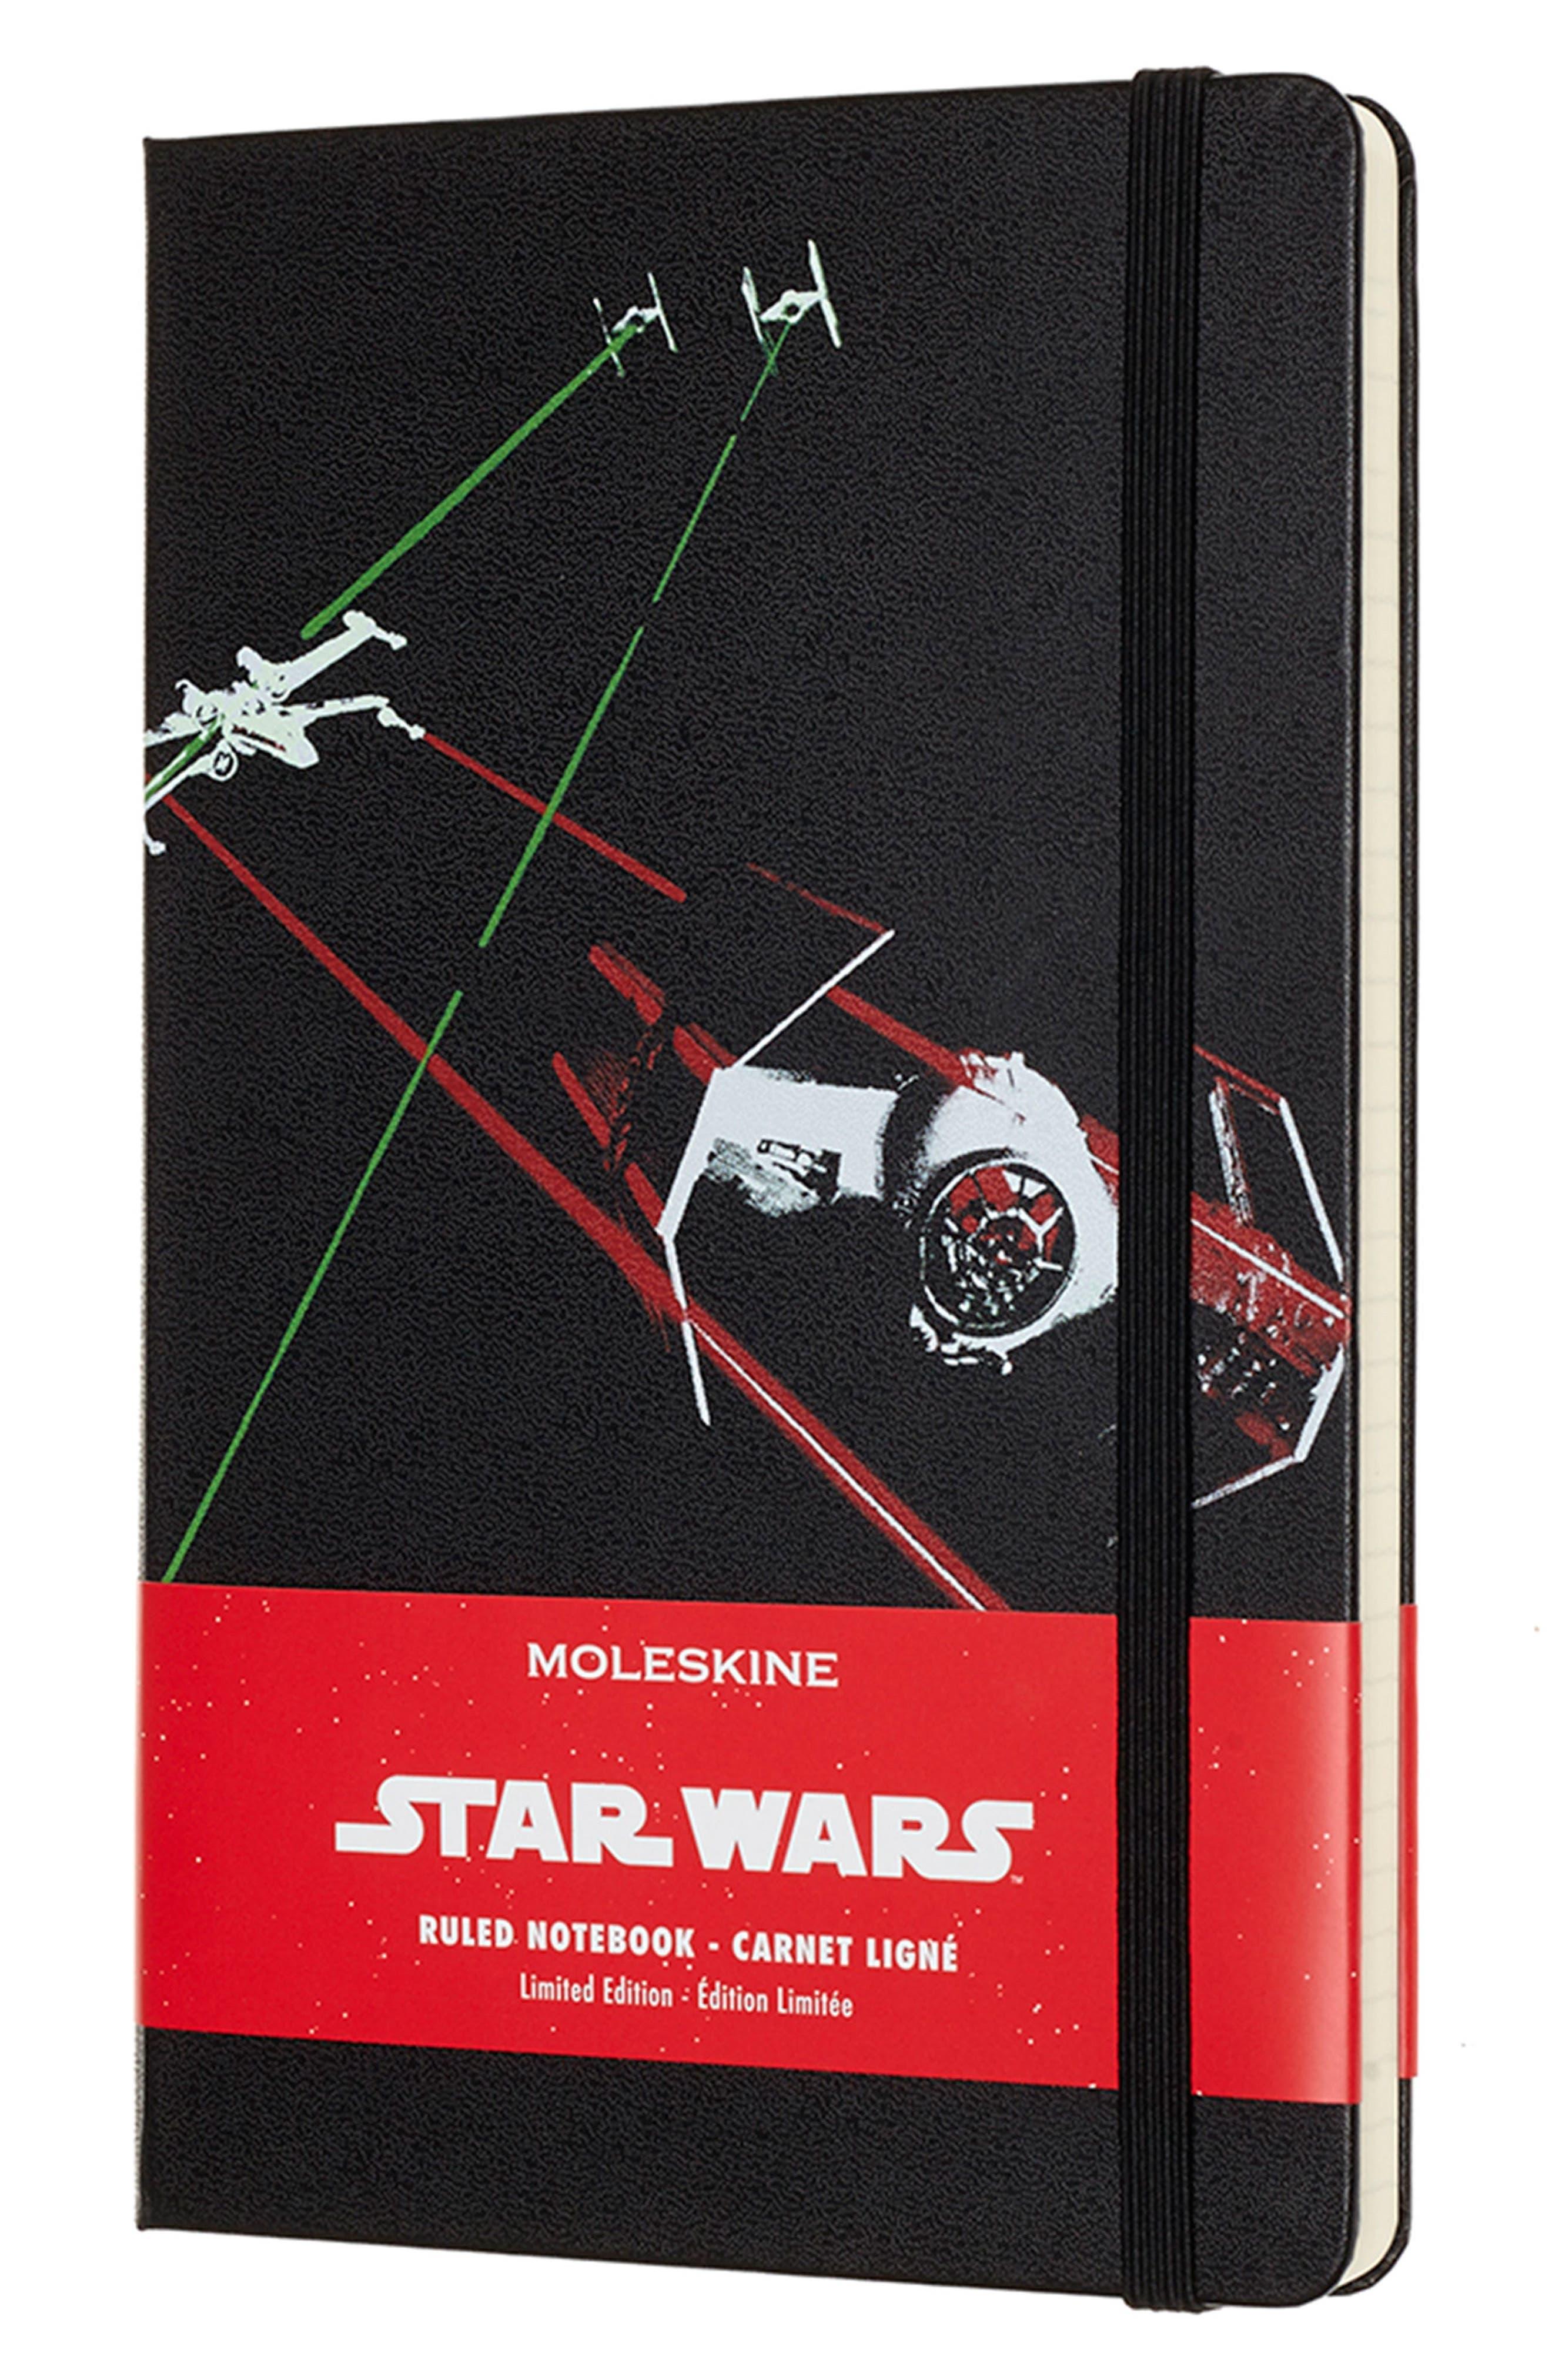 Moleskine® Star Wars™ Limited Edition - Tie Fighter Notebook